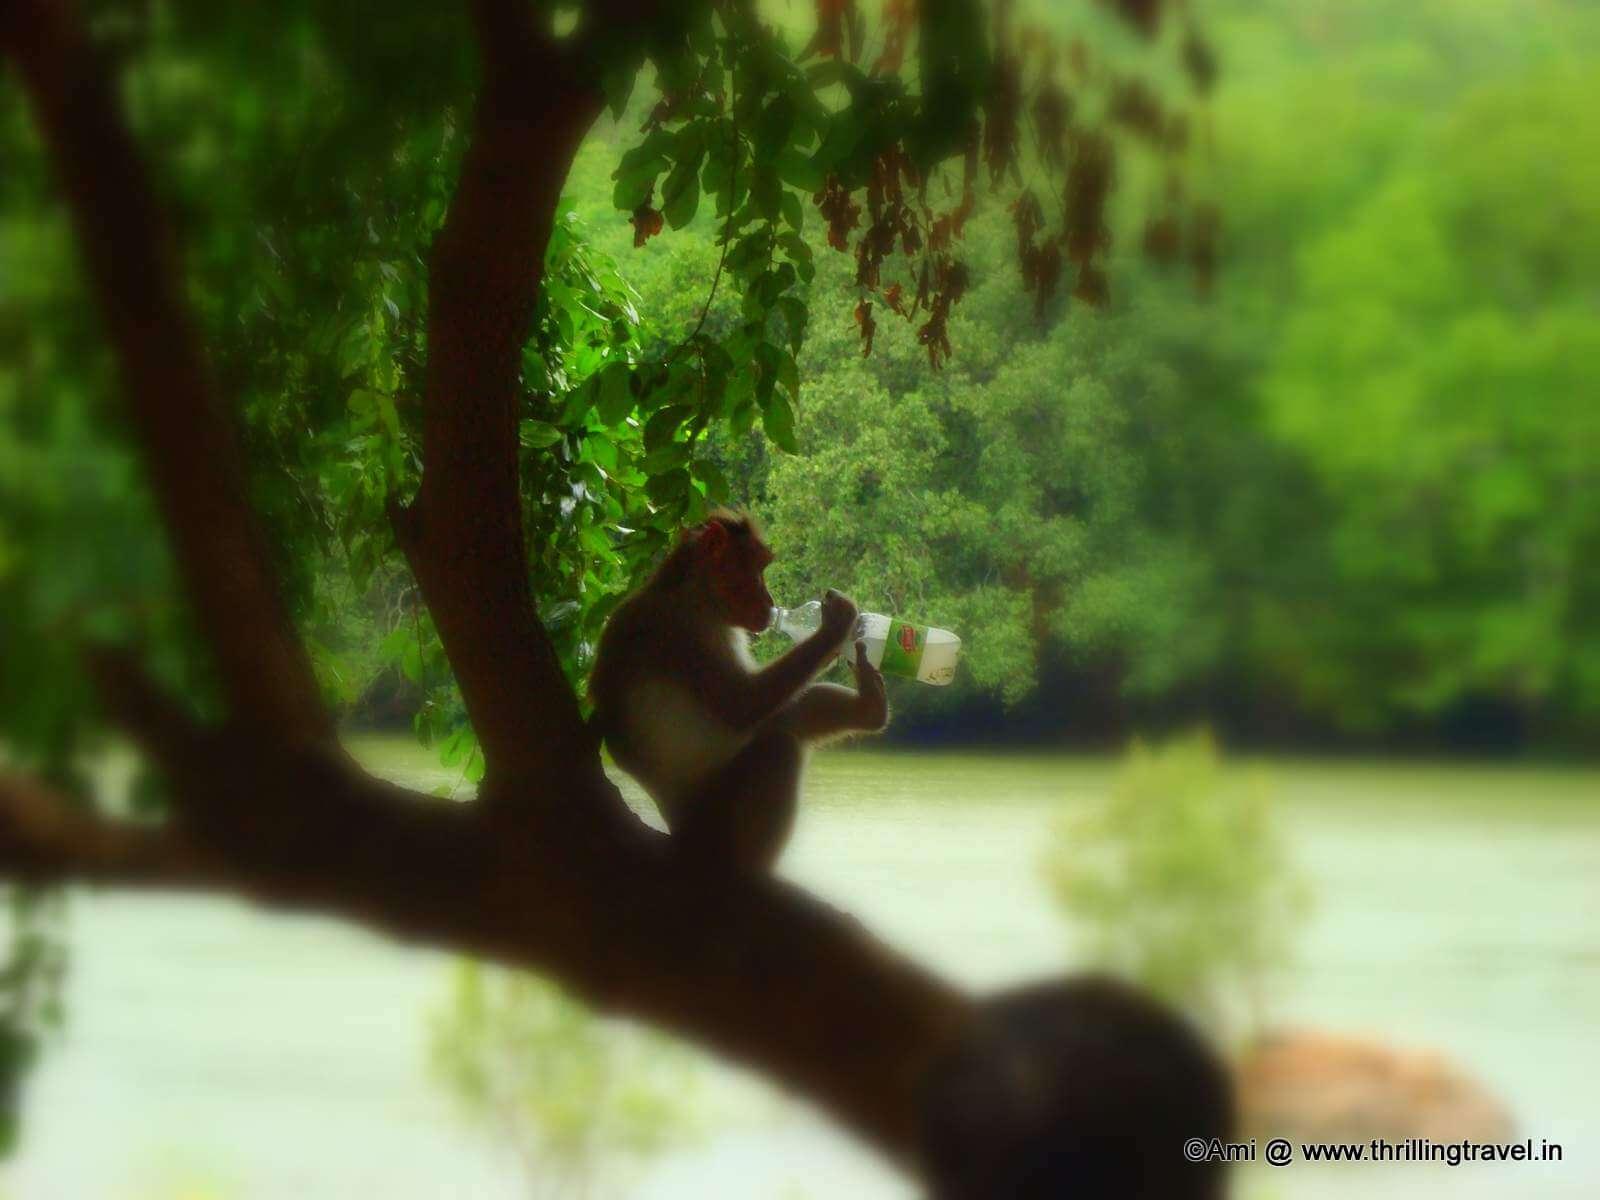 Monkey at Bheemeshwari Fishing Camp